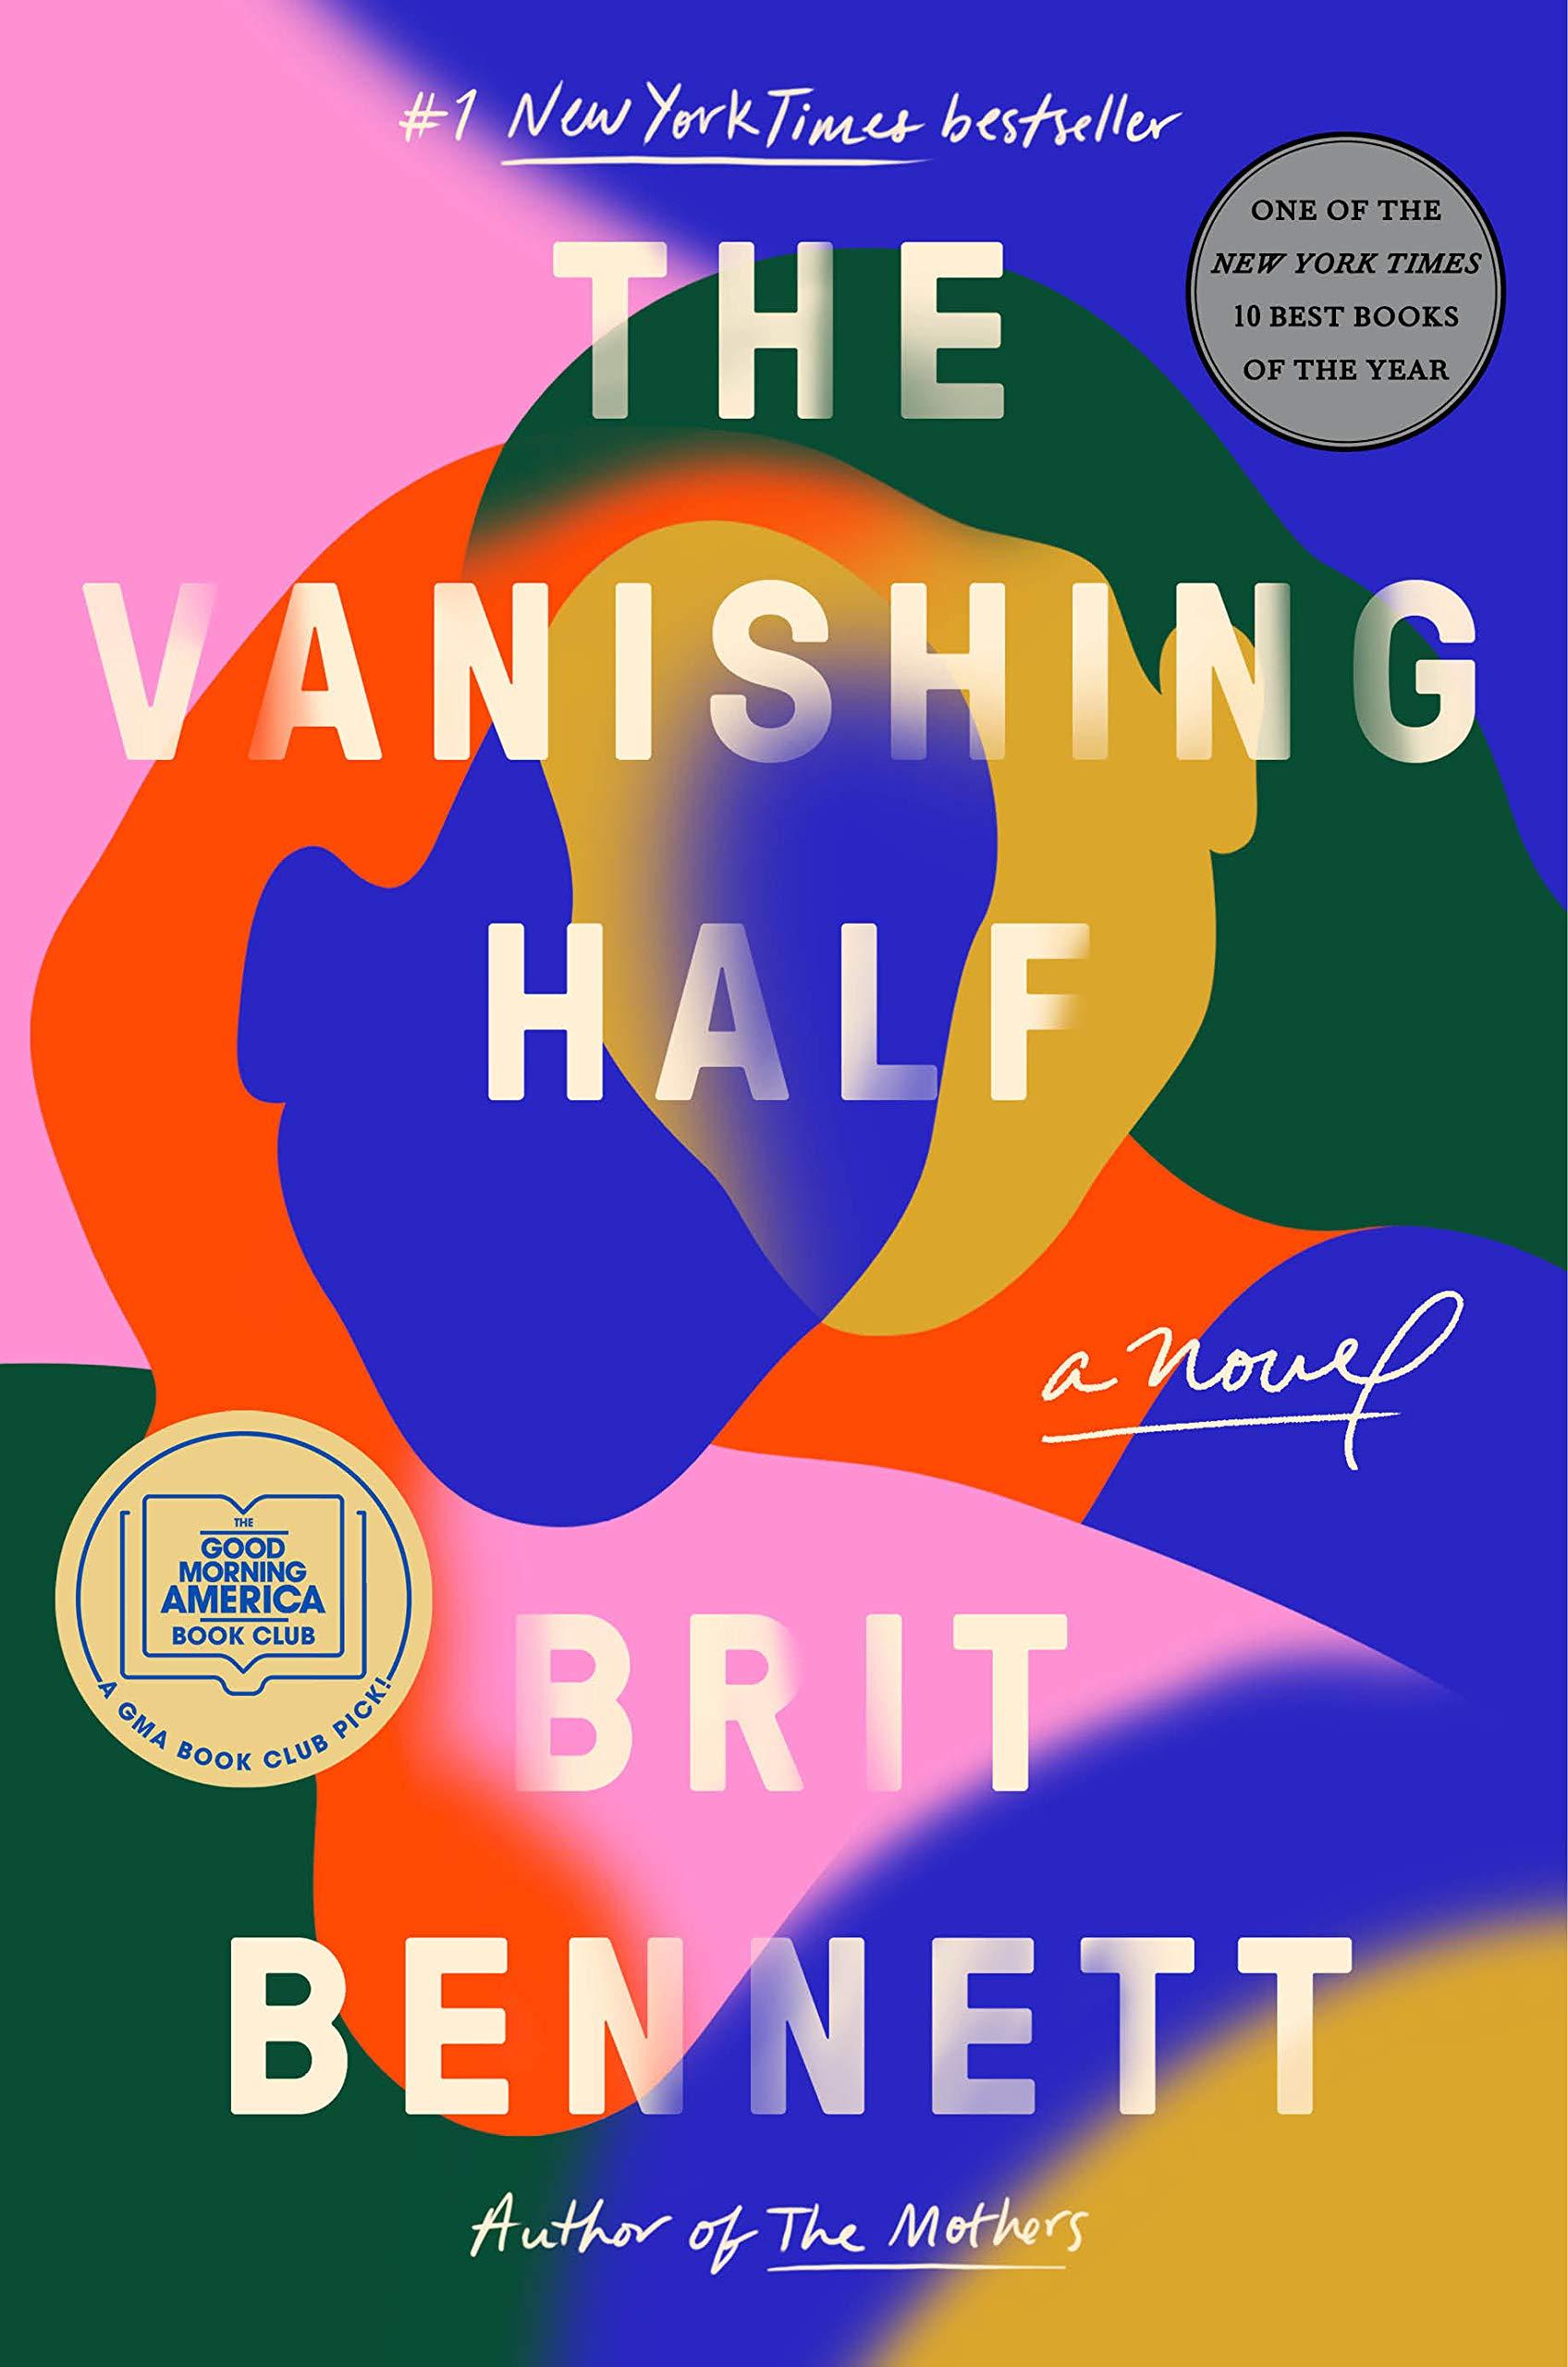 The Vanishing Half by Brit Bennet